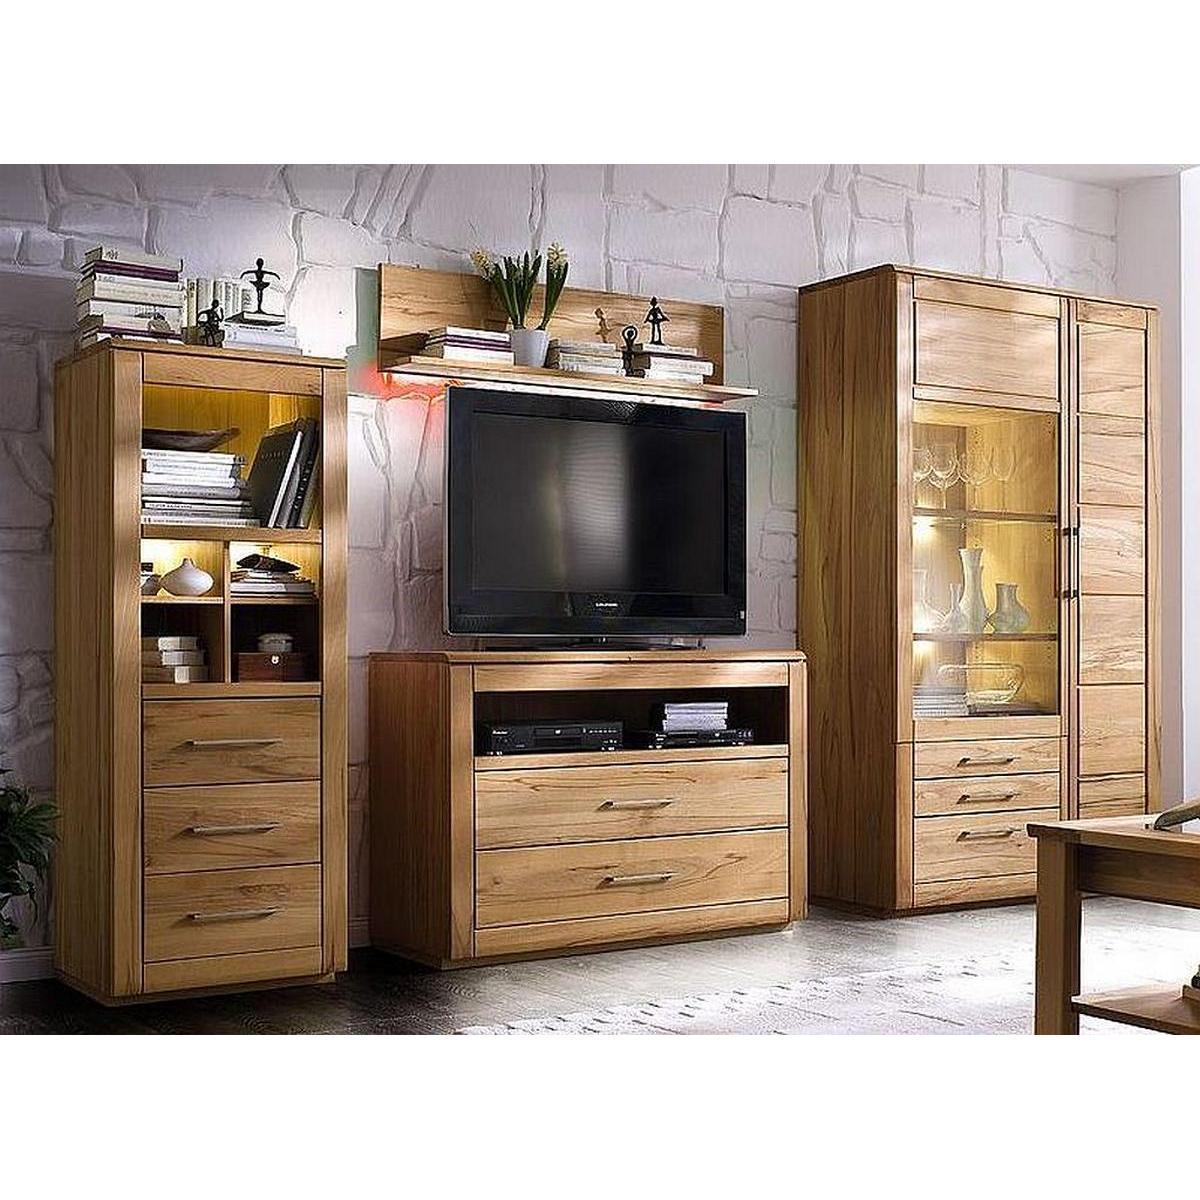 vollholz anbauwand kernbuche massiv bio ge lt 4 teilig oxford. Black Bedroom Furniture Sets. Home Design Ideas